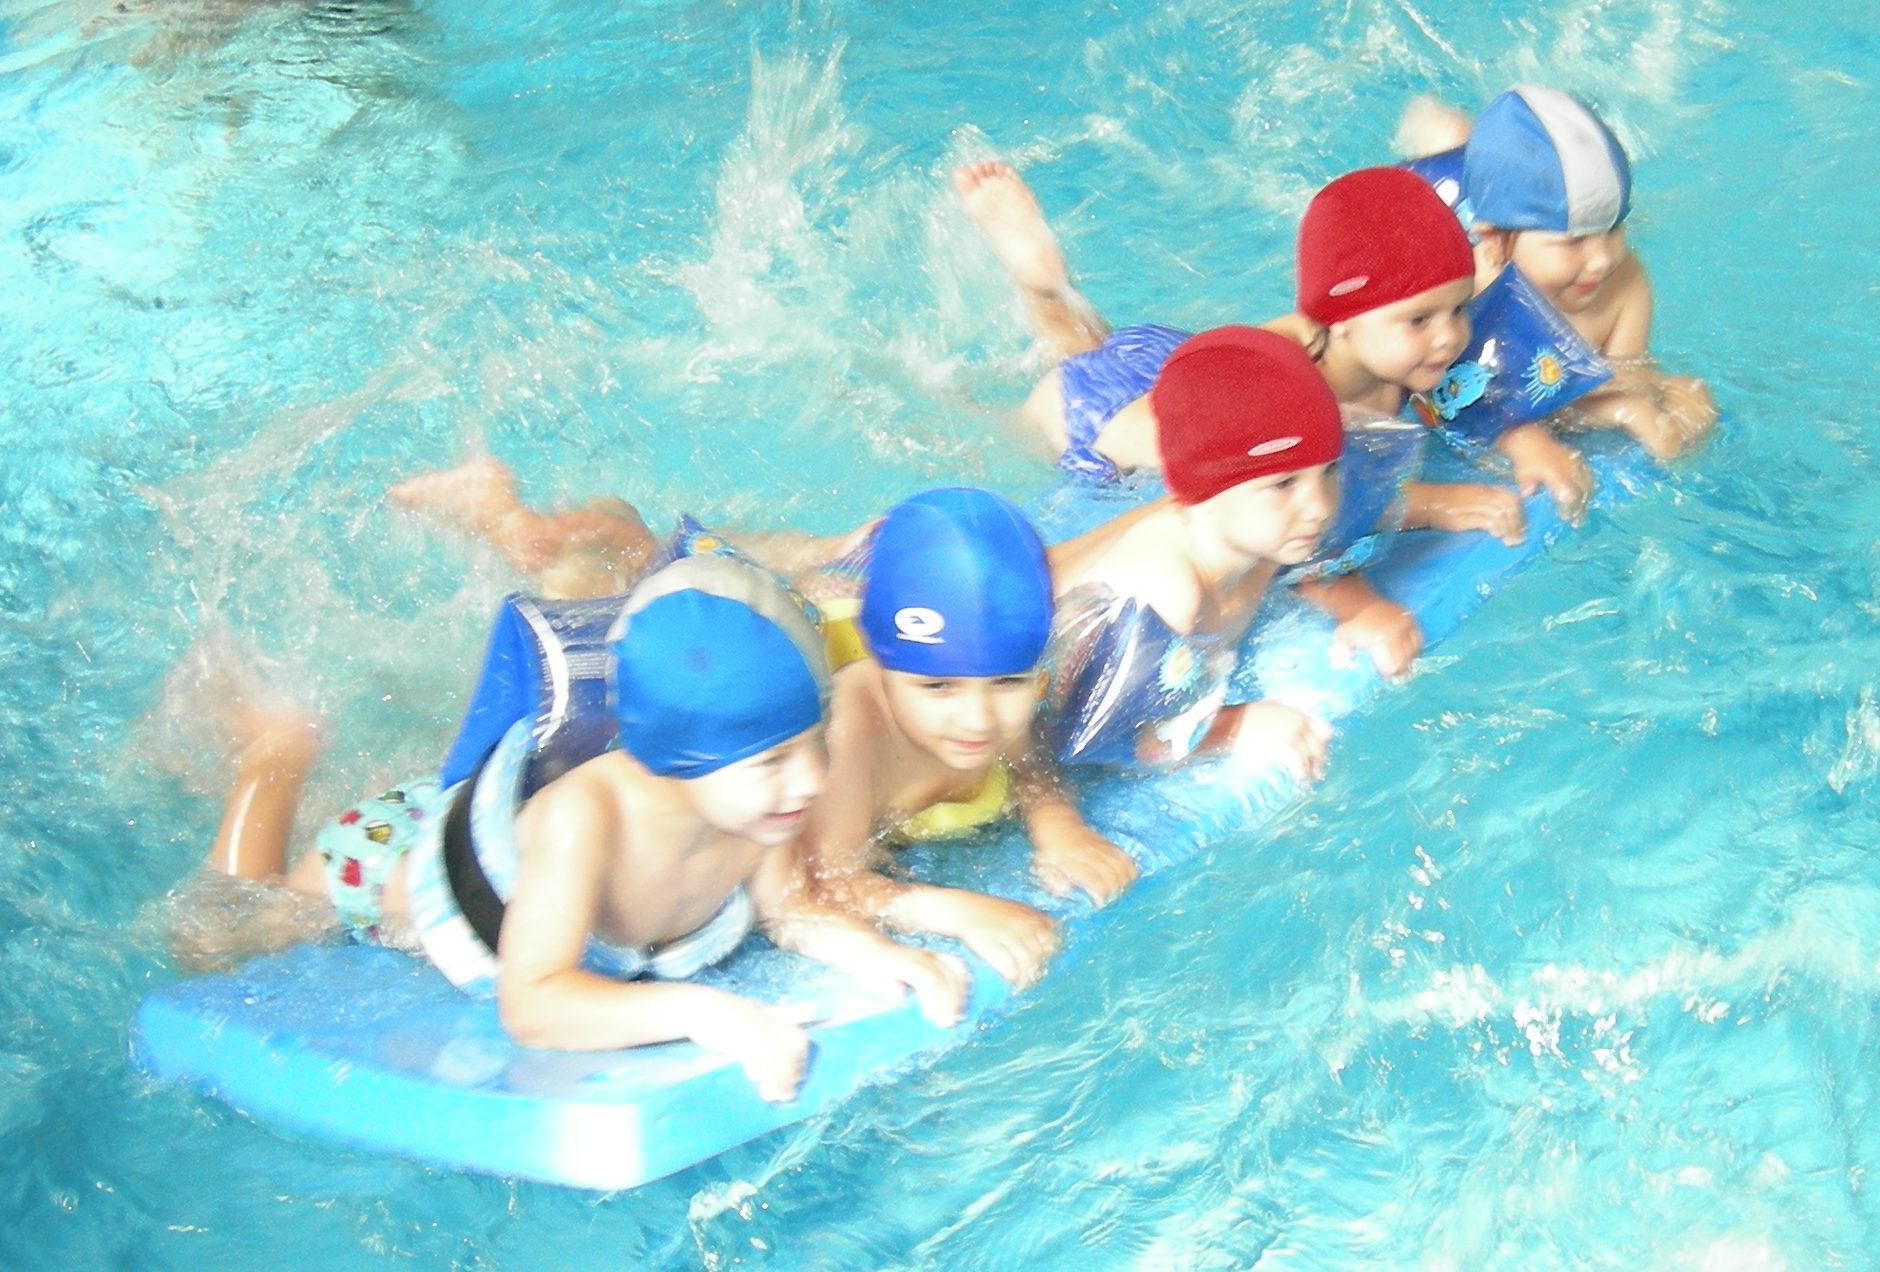 Bimbi dai 3 anni - Bambini in piscina a 3 anni ...